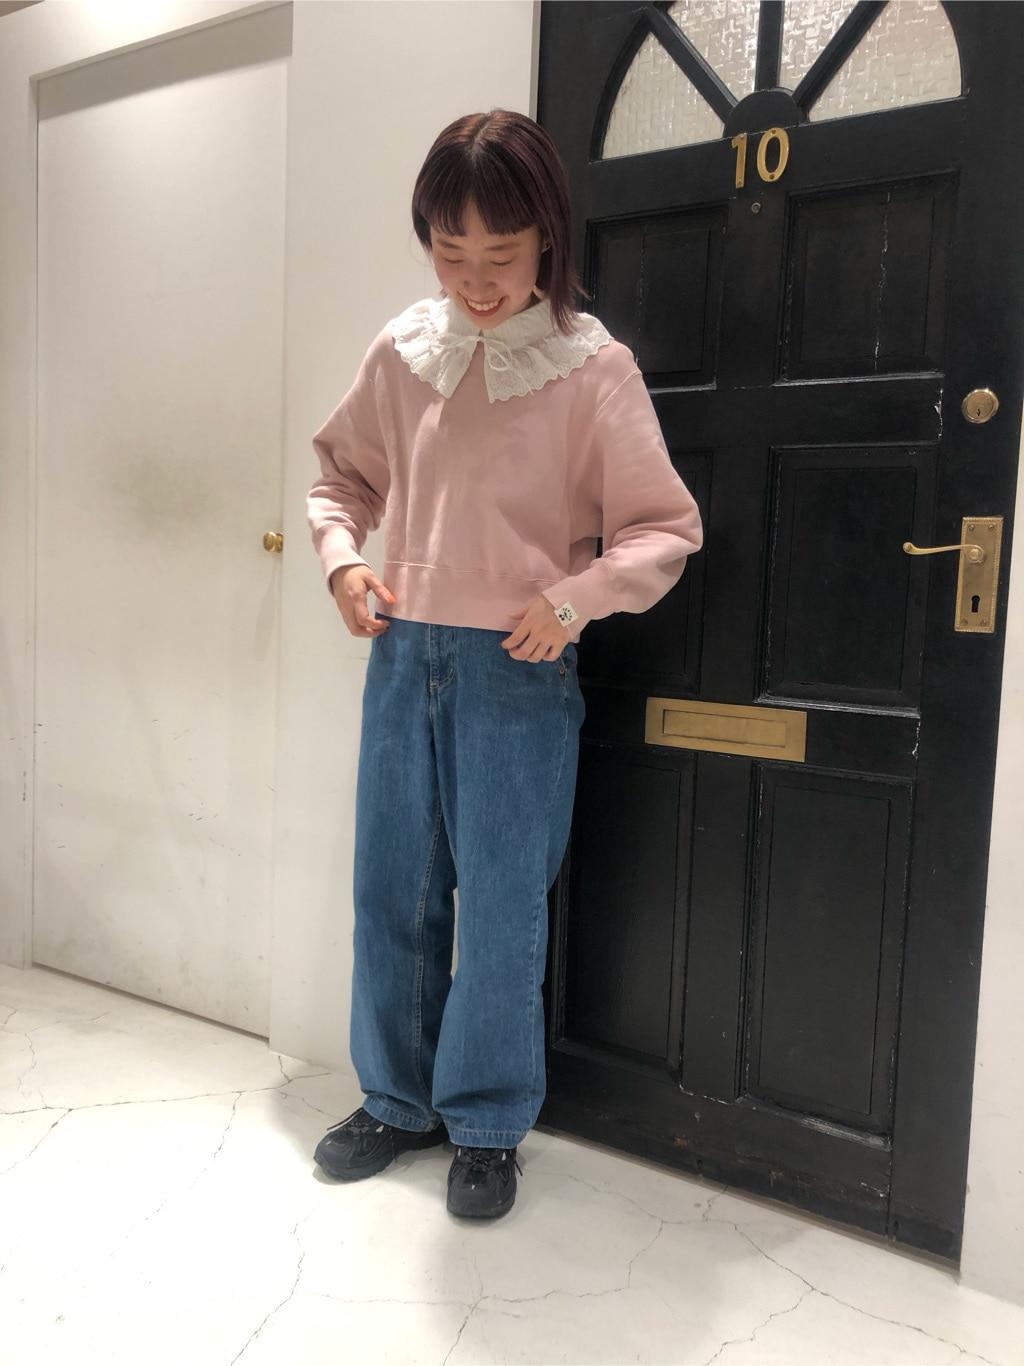 Dot and Stripes CHILD WOMAN ルクアイーレ 身長:157cm 2021.01.08